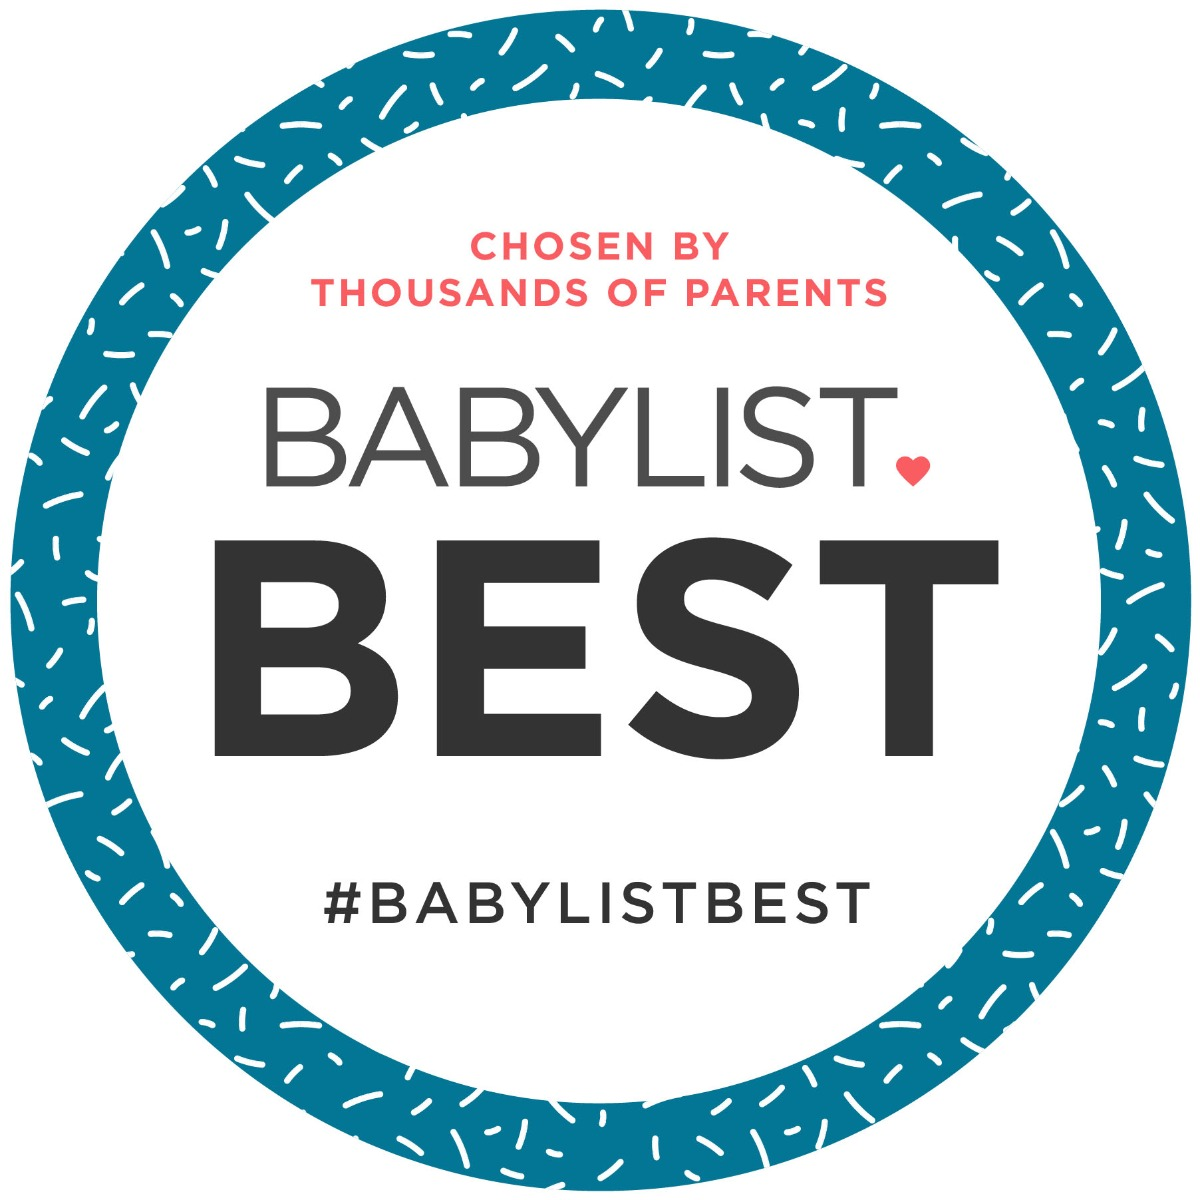 BabyList Best